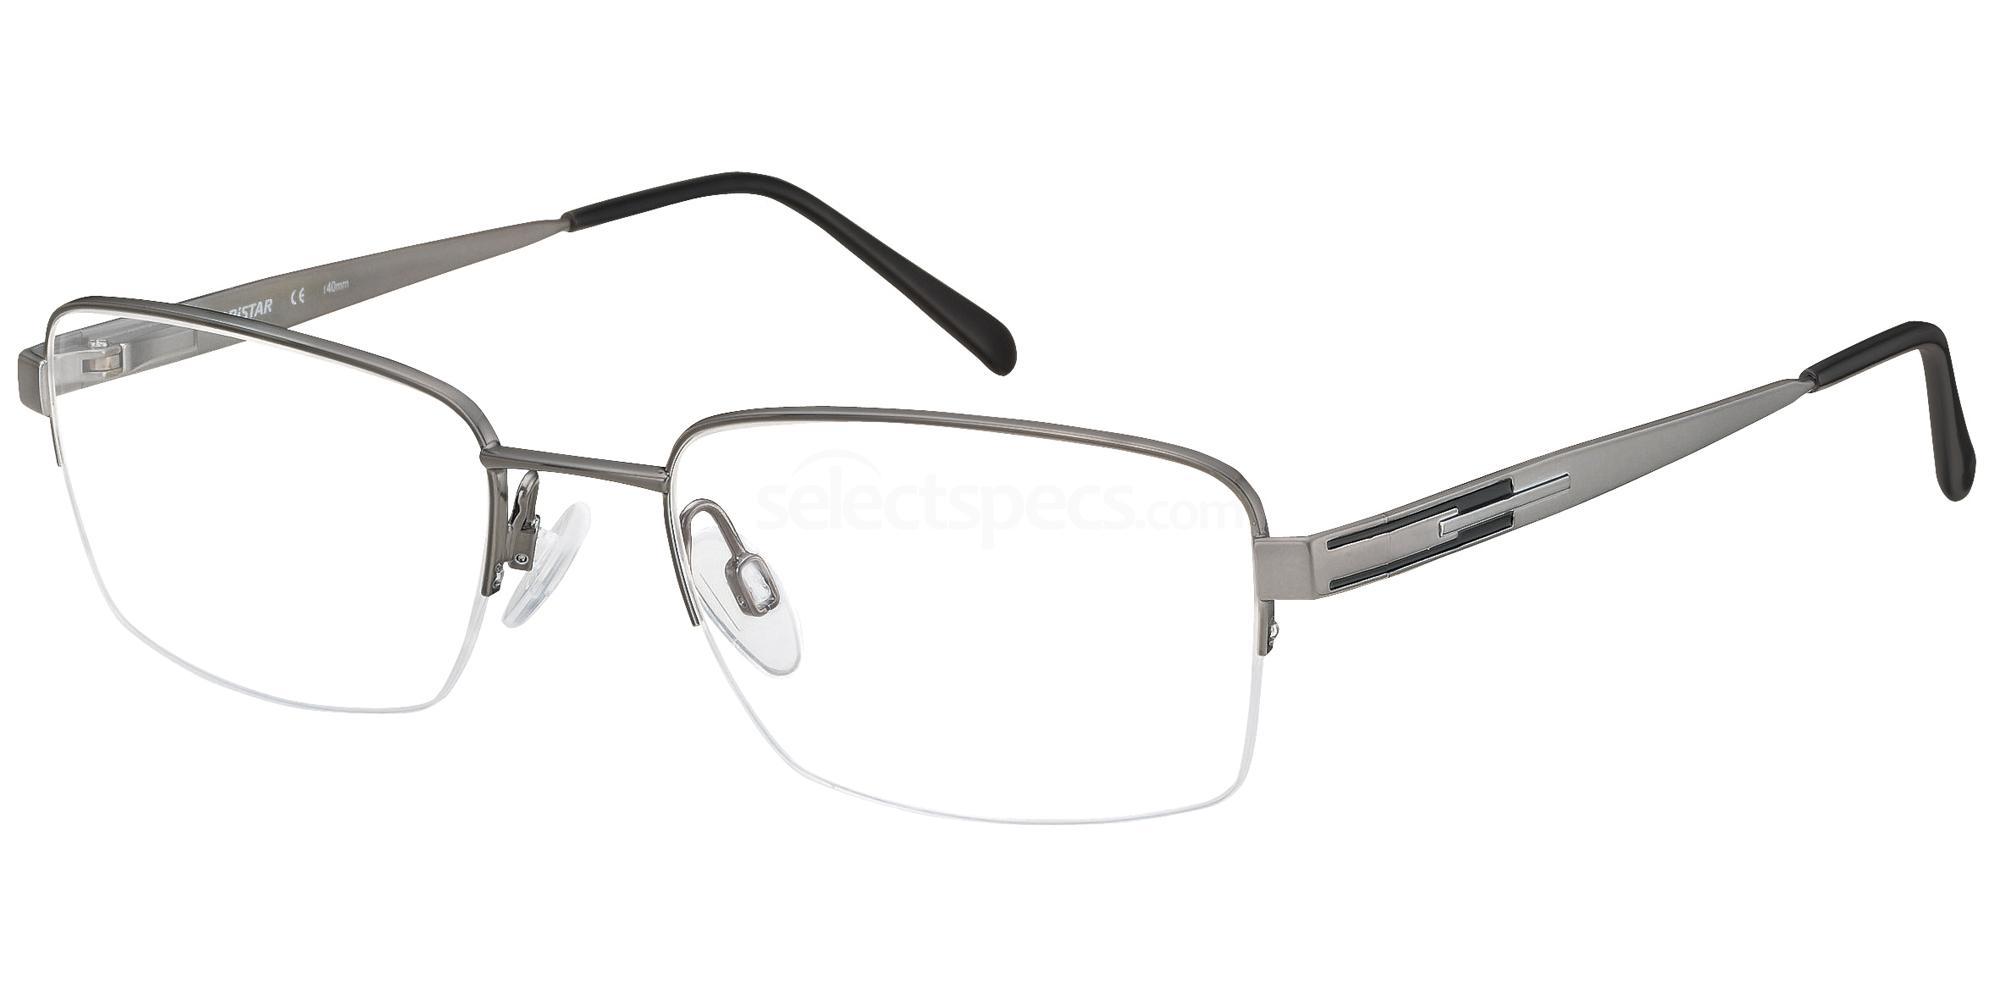 505 AR16233 Glasses, Aristar